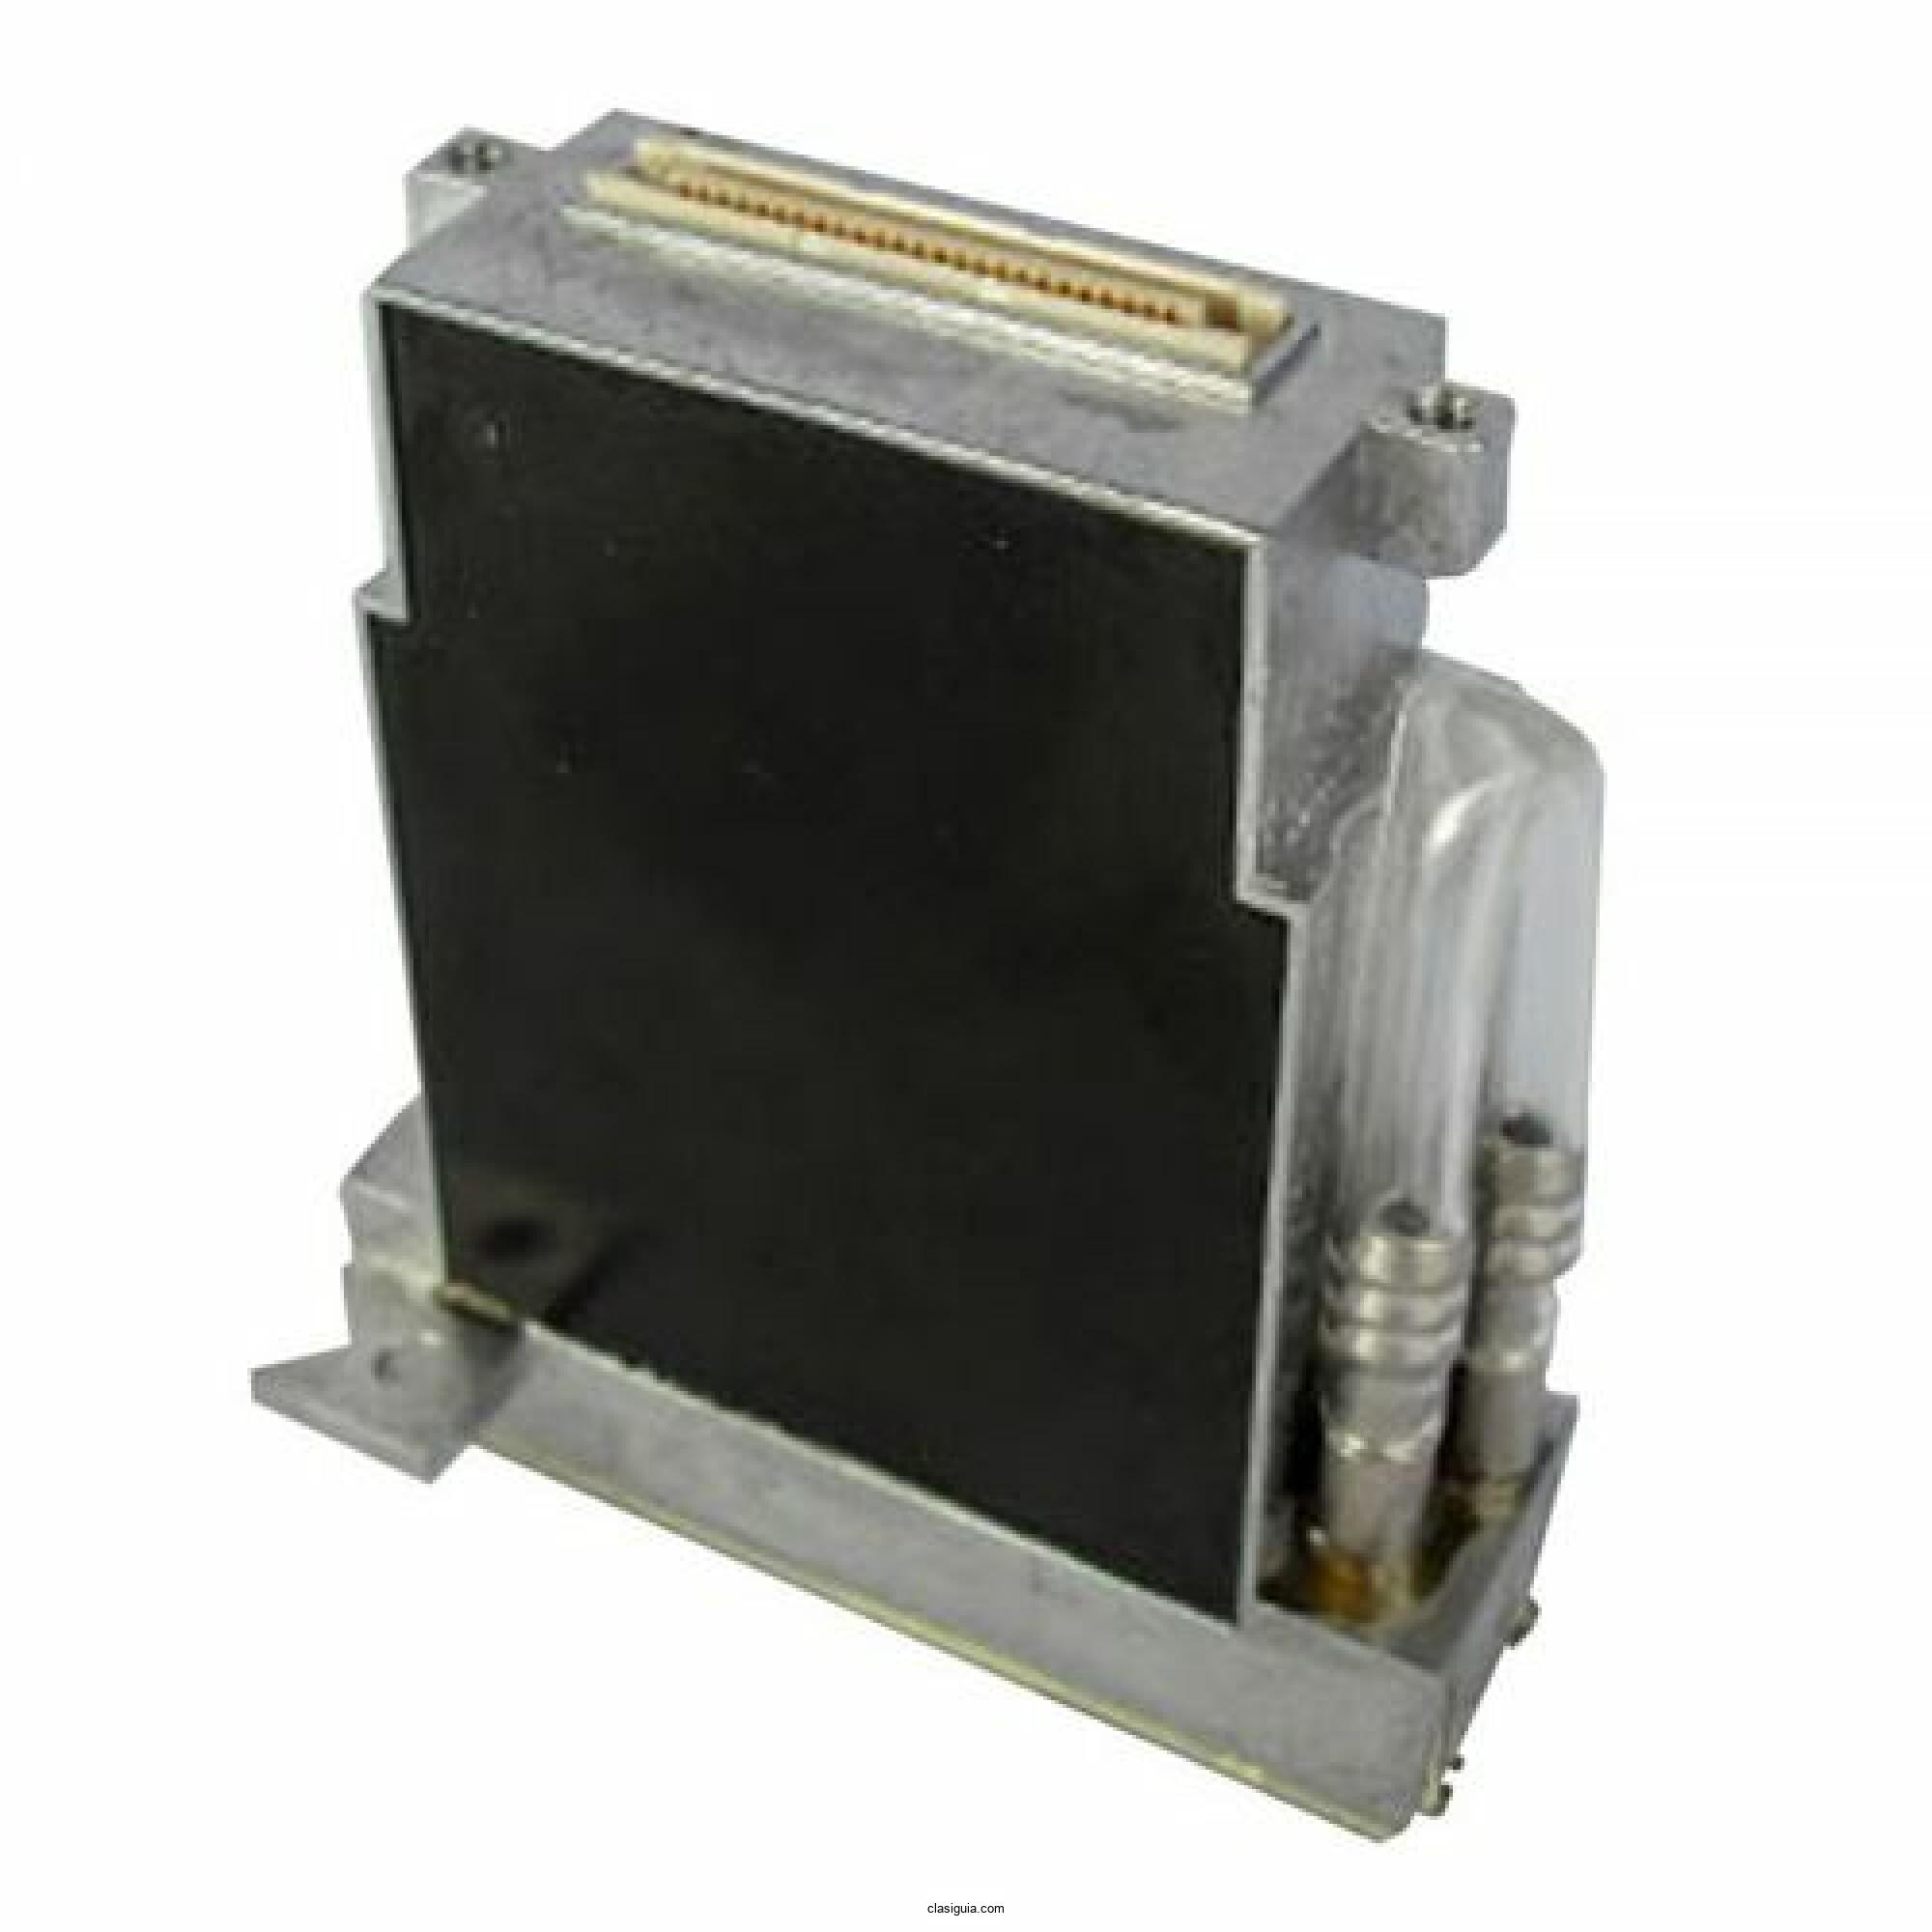 HP Designjet 9000S Printhead (INDOELECTRONIC)